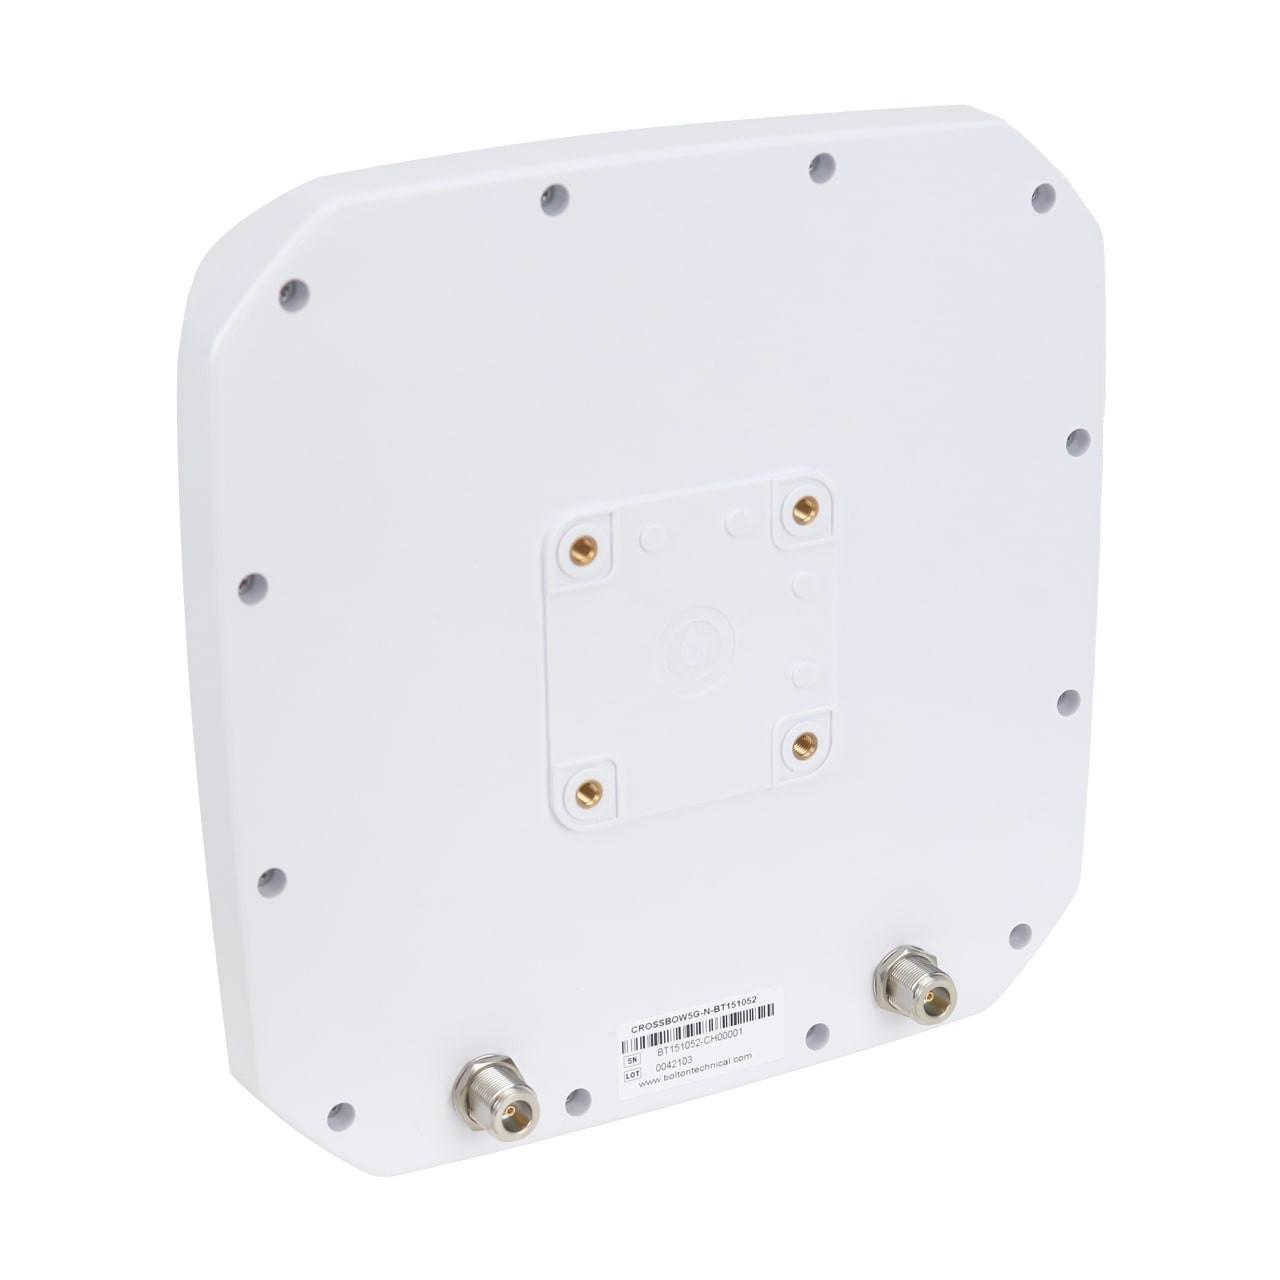 The Crossbow (N-Female) - MIMO Cross Polarized 5G Antenna